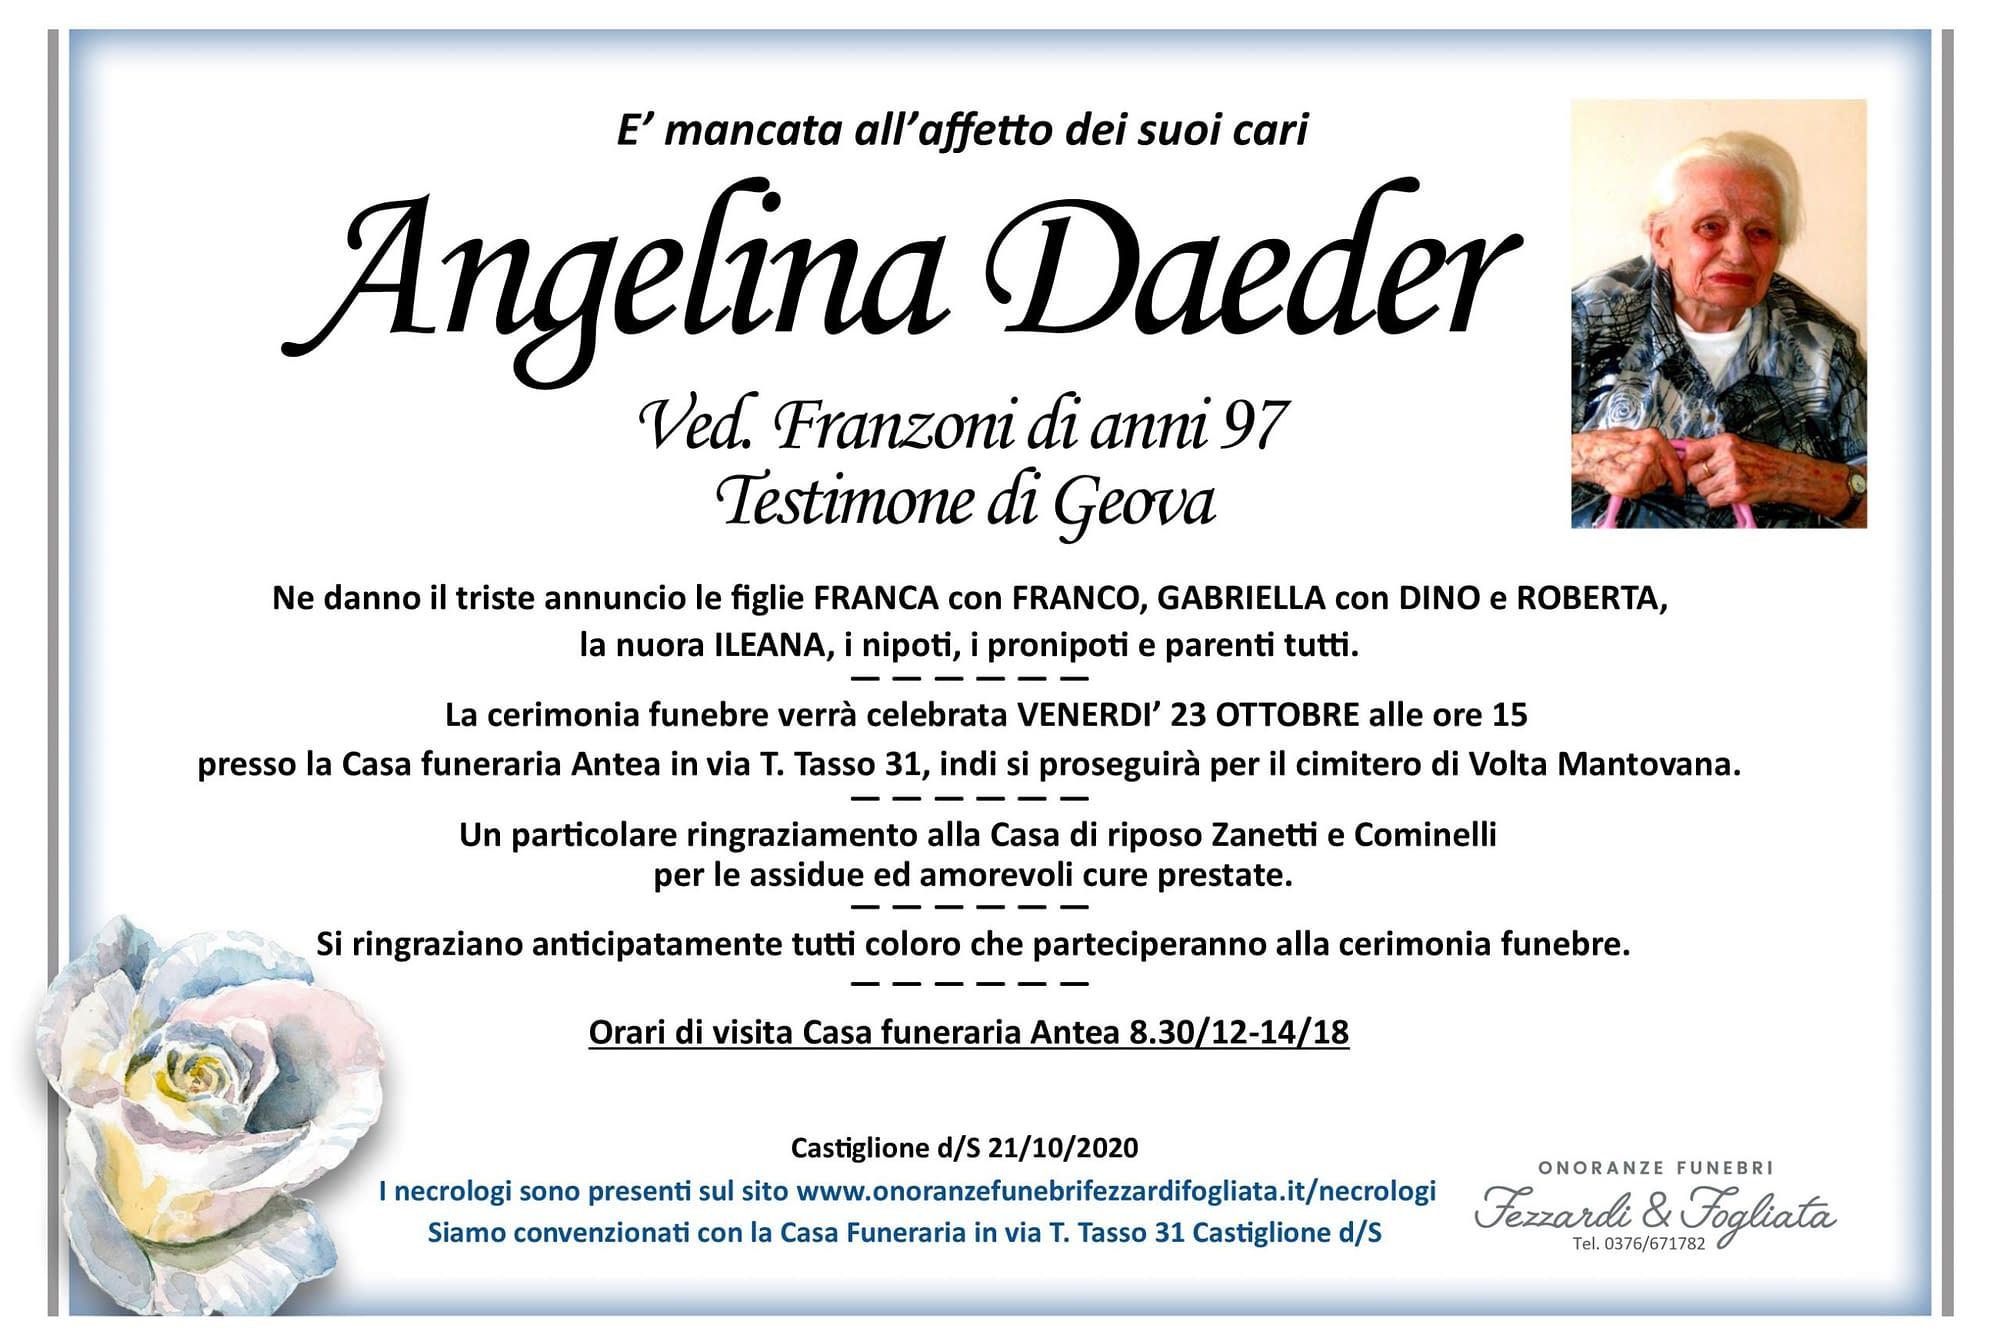 Necrologio Angiolina Daeder